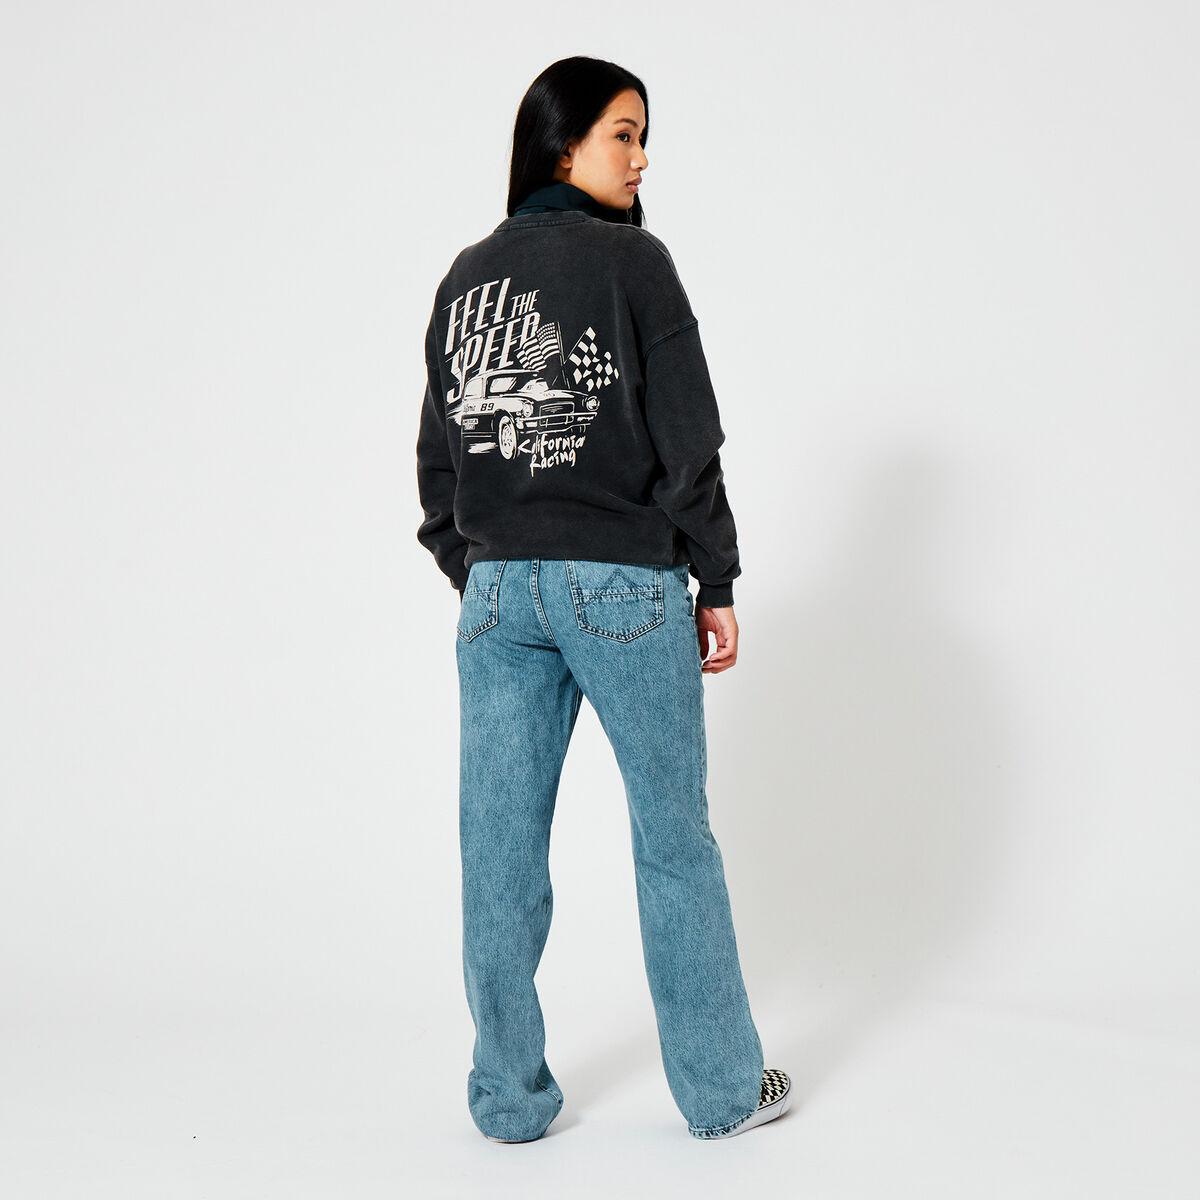 Sweater Selah